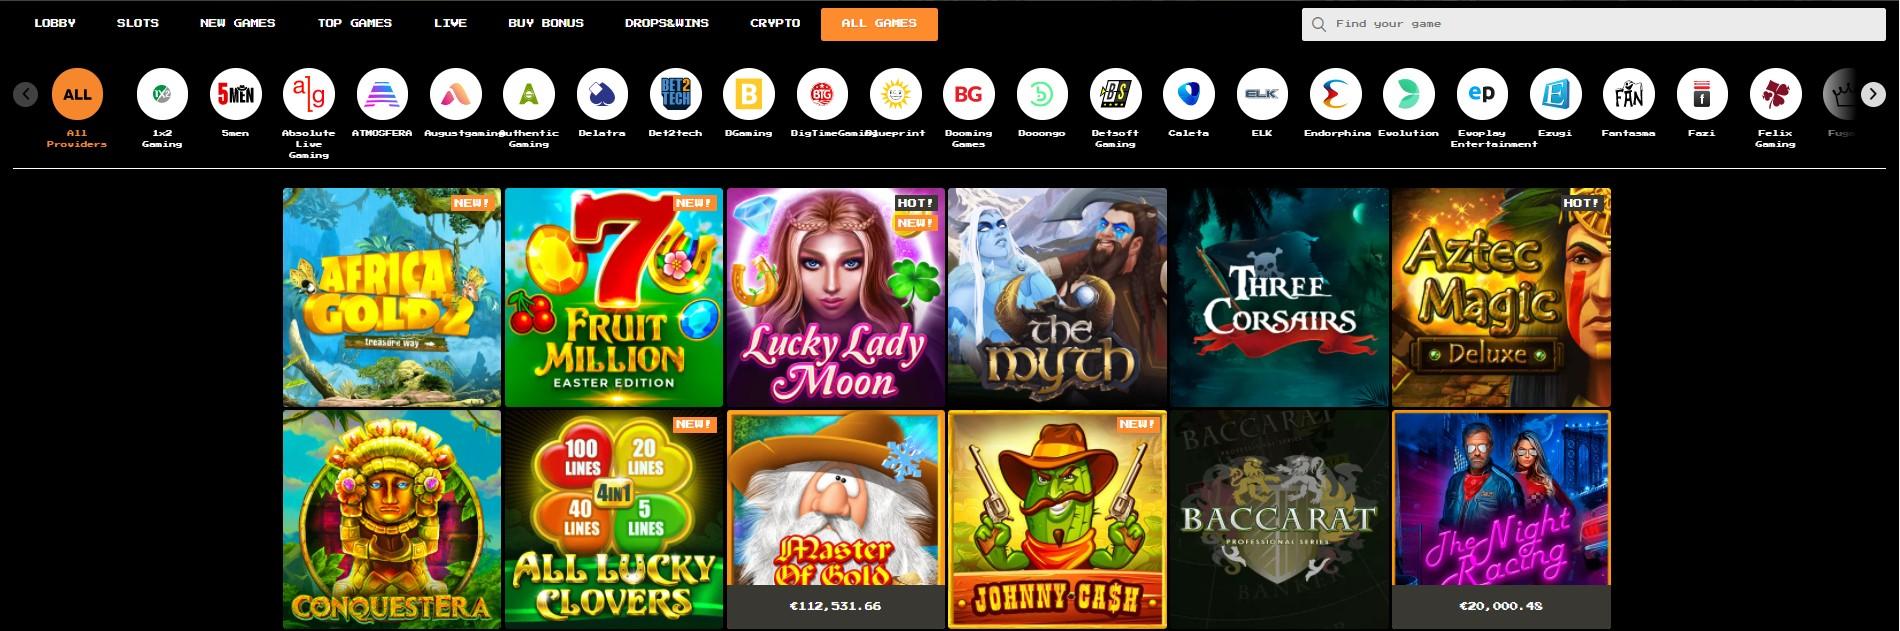 bitkingz games selection